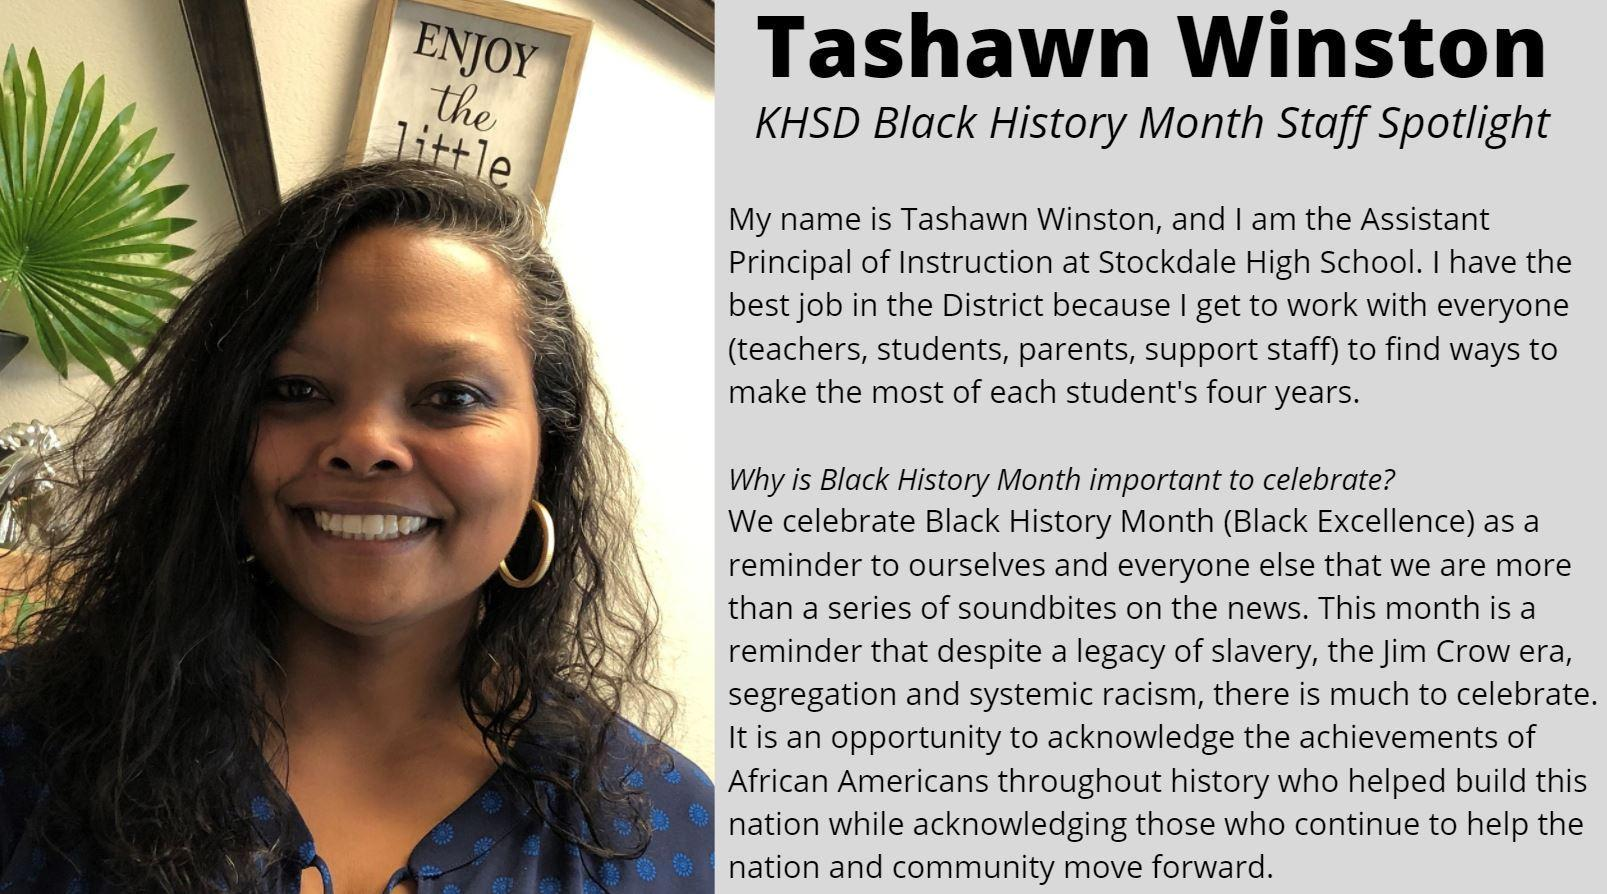 KHSD Black History Month Staff Spotlight: Tashawn Winston, Stockdale Assistant Principal of Instruction